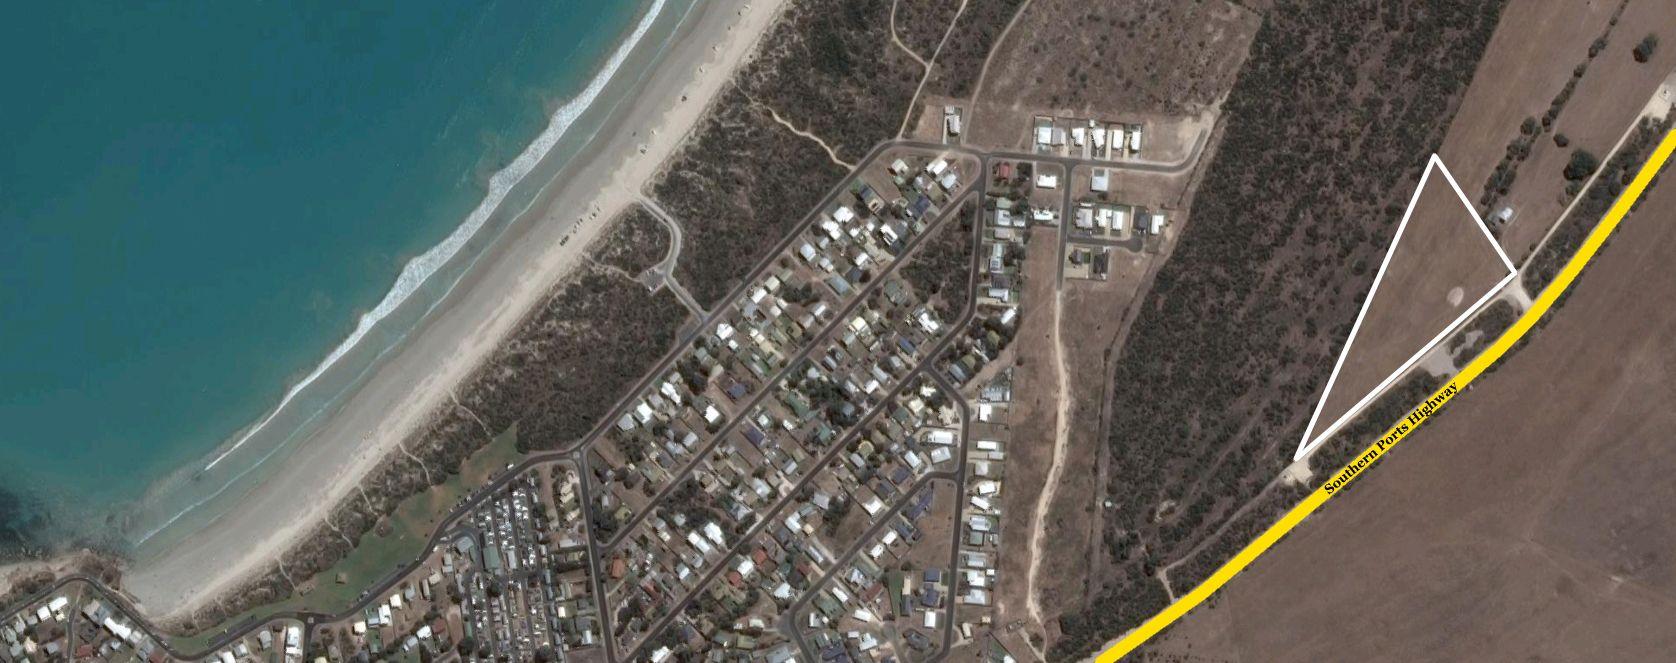 Lot 2 Southern Ports Highway, Robe SA 5276, Image 2